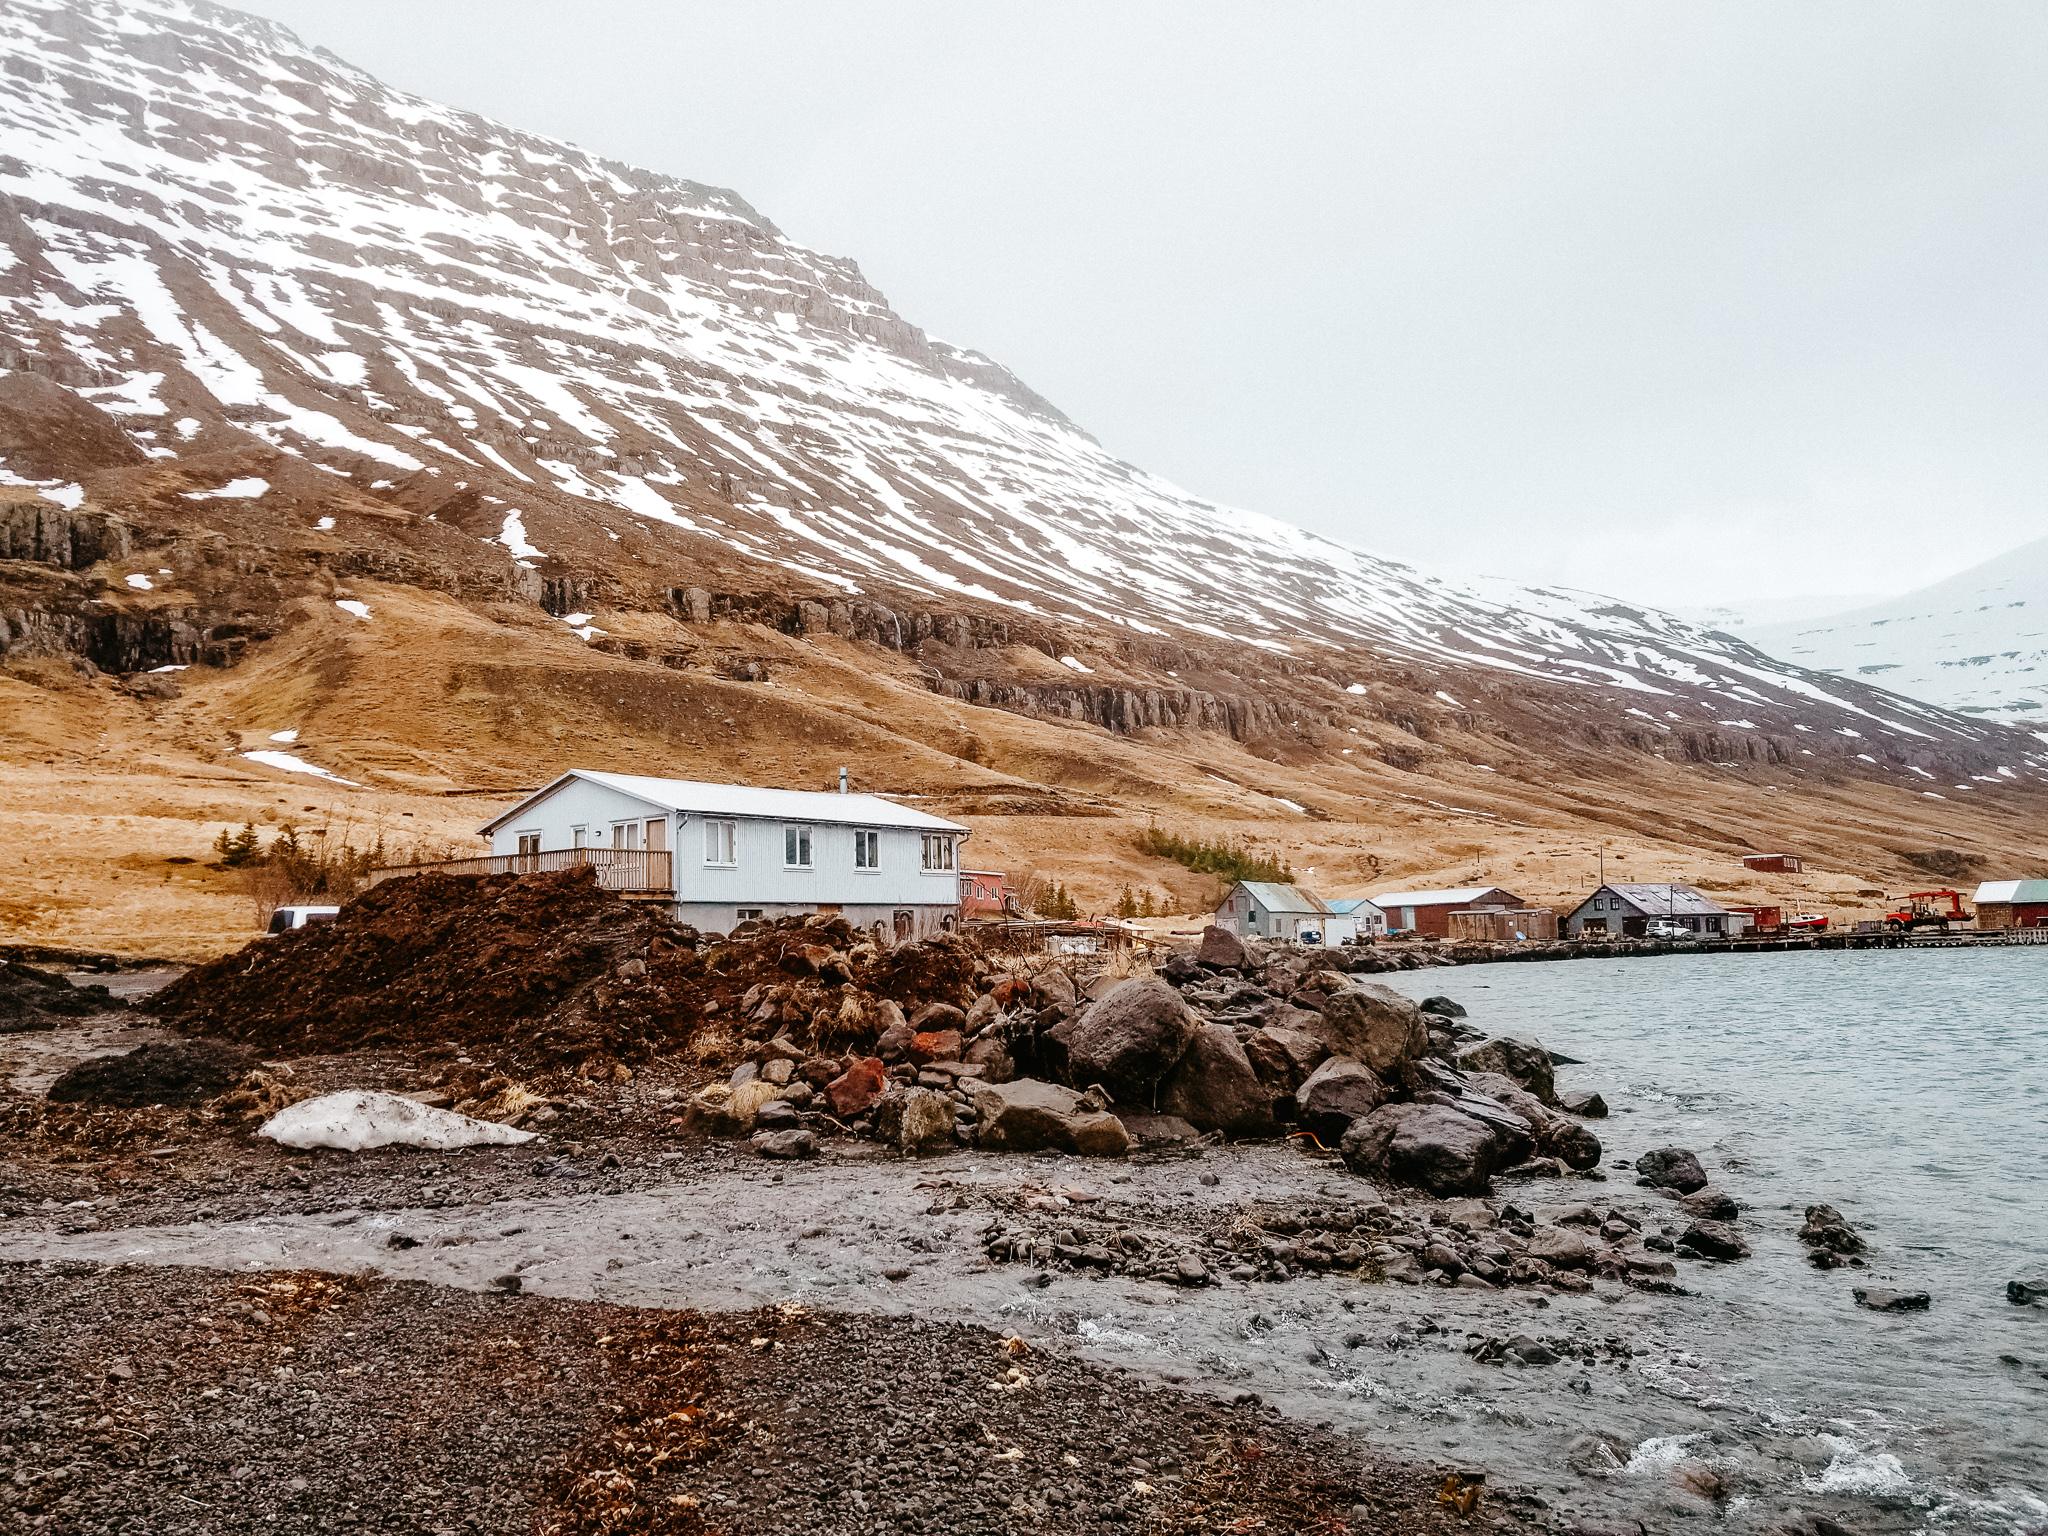 Iceland trip on a budget